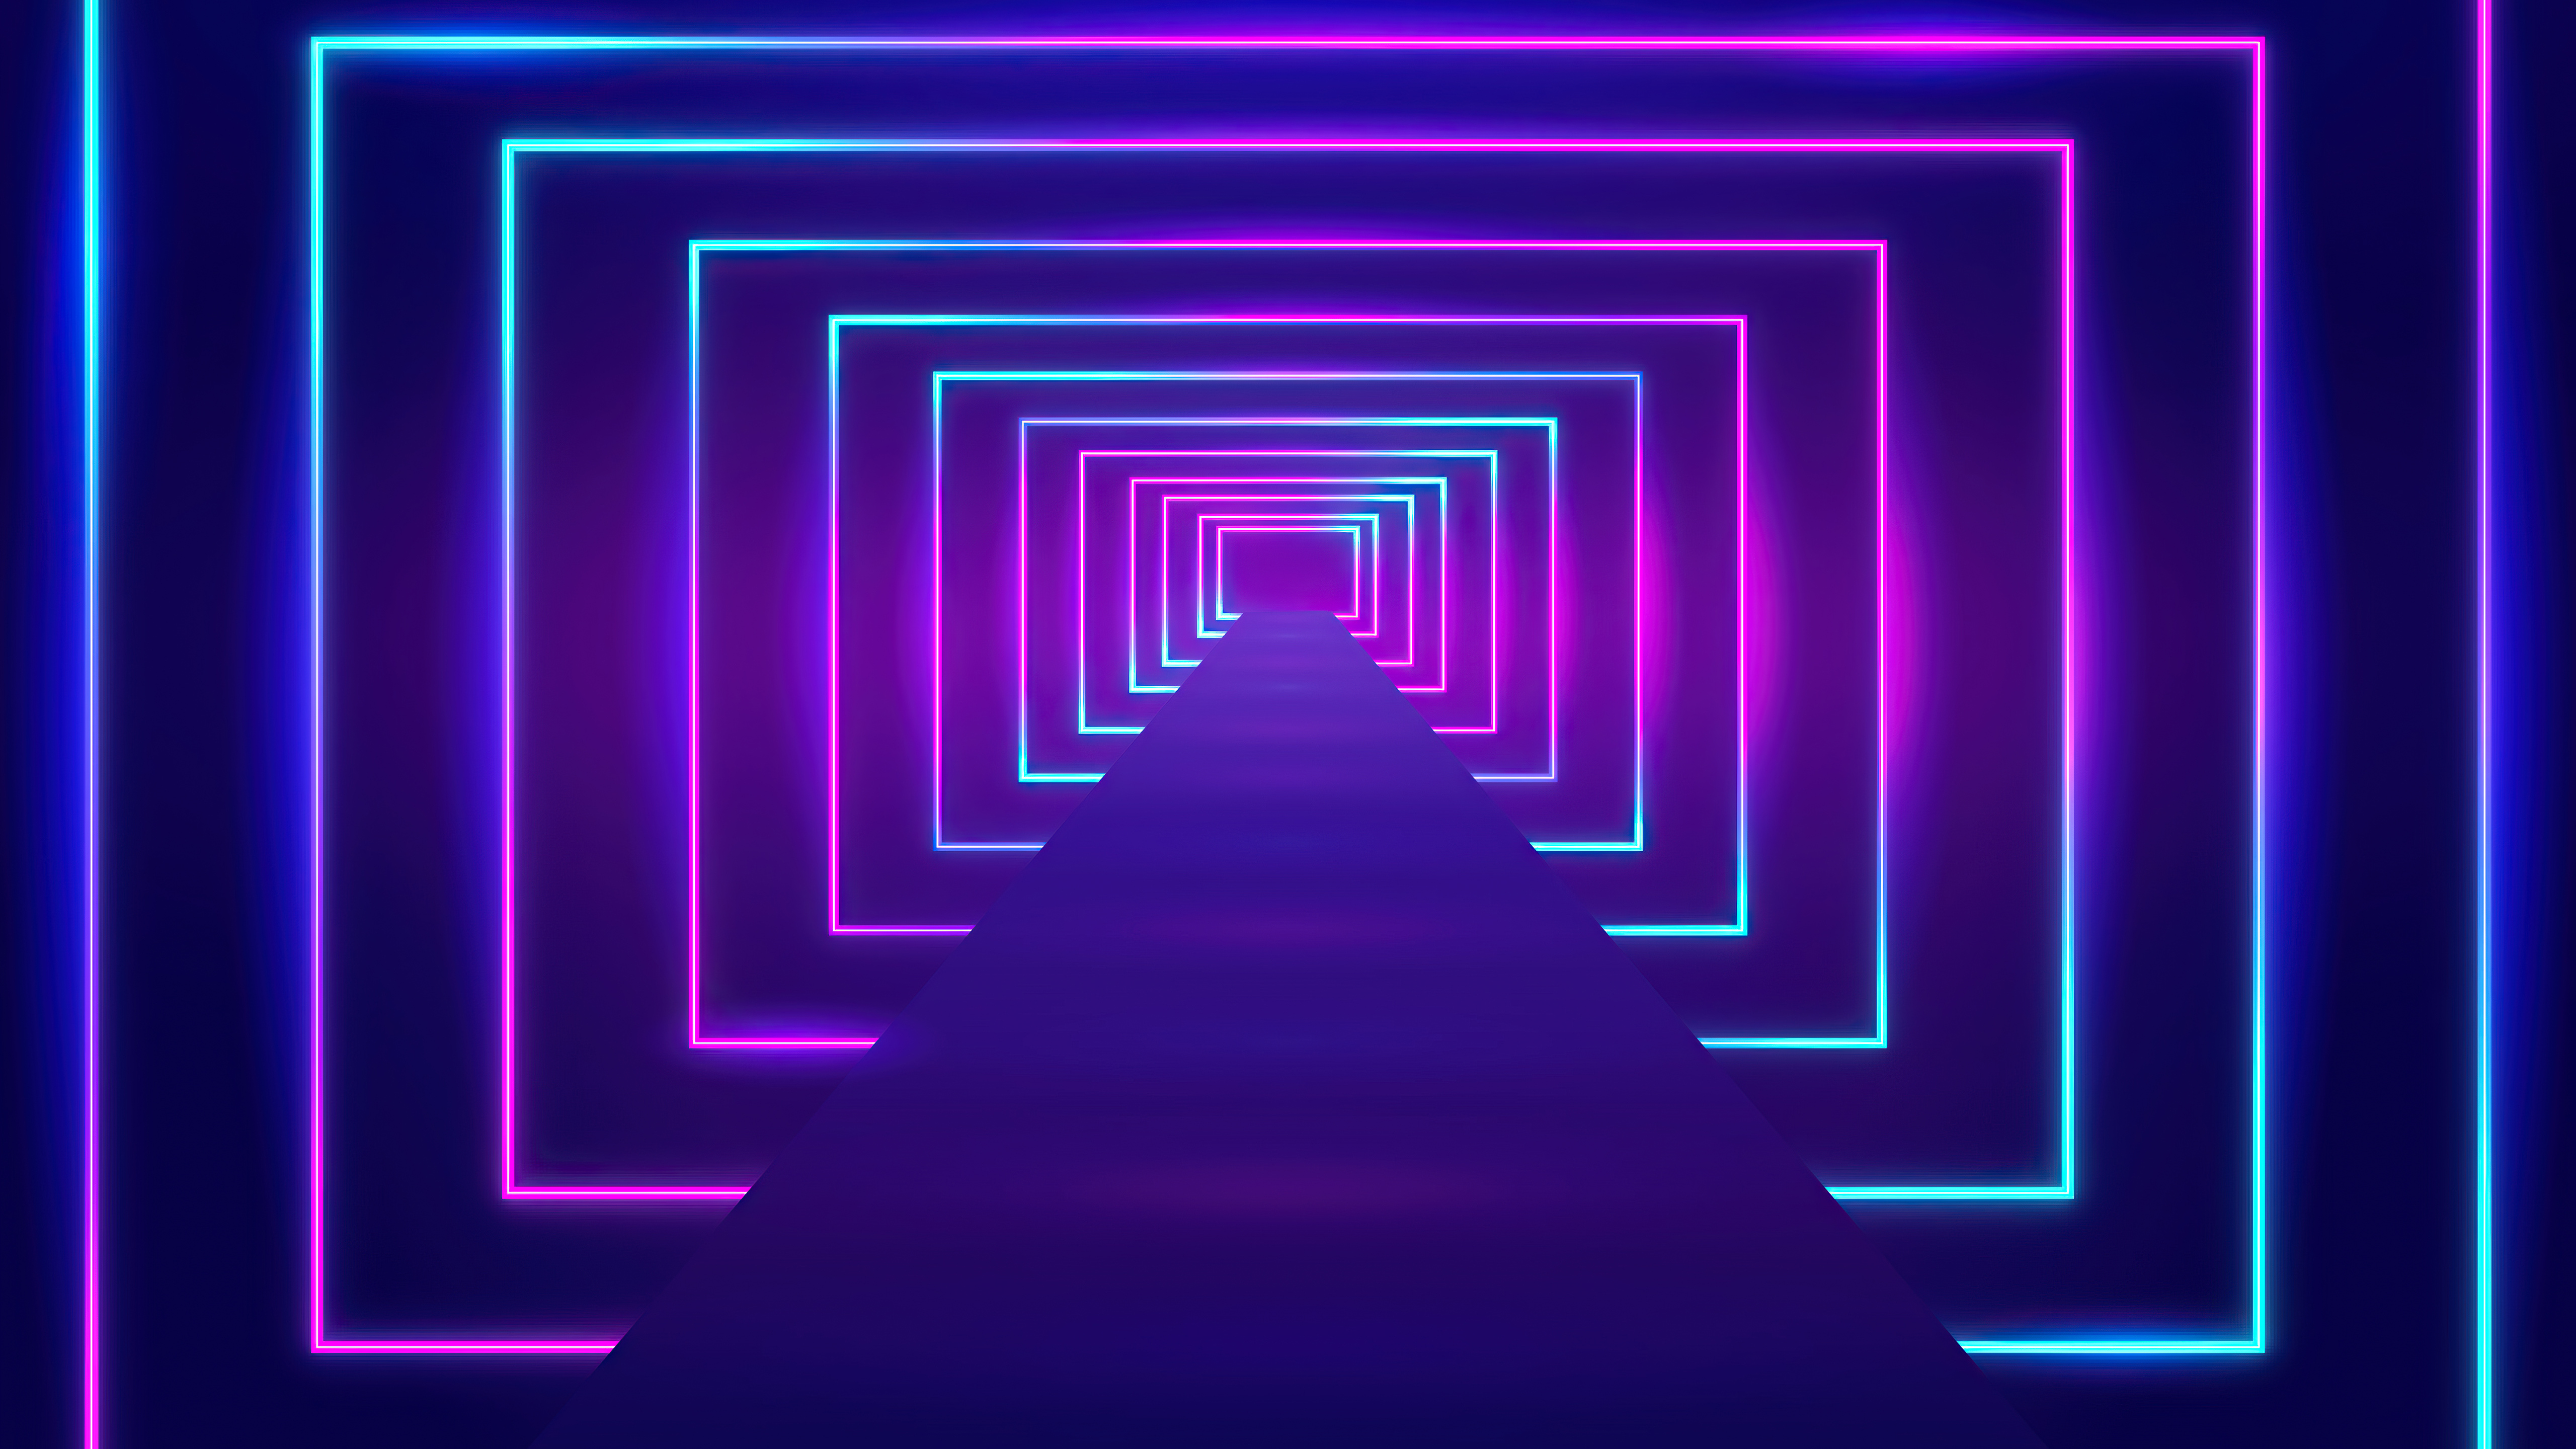 optical-illustion-abstract-5k-m0.jpg